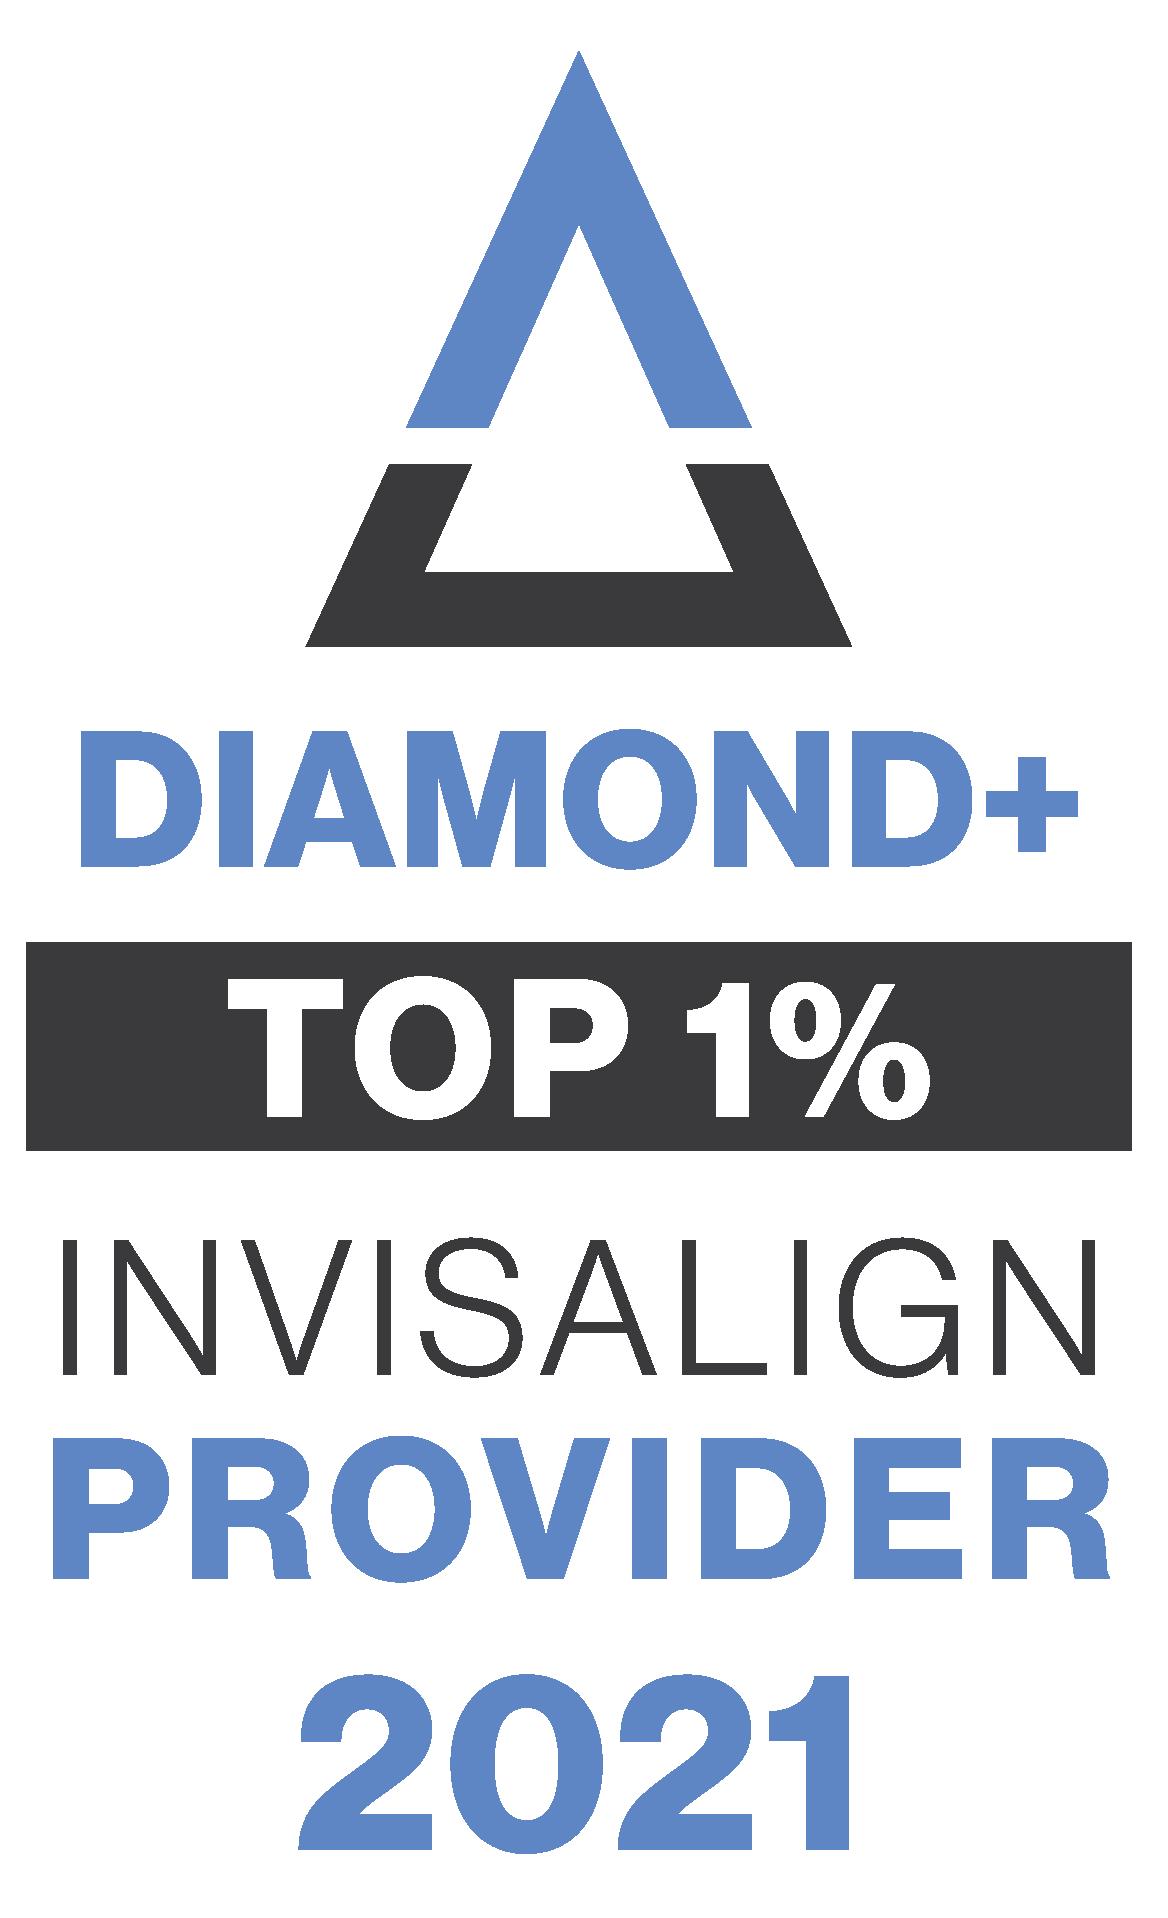 Invisalign Diamond Top 1%